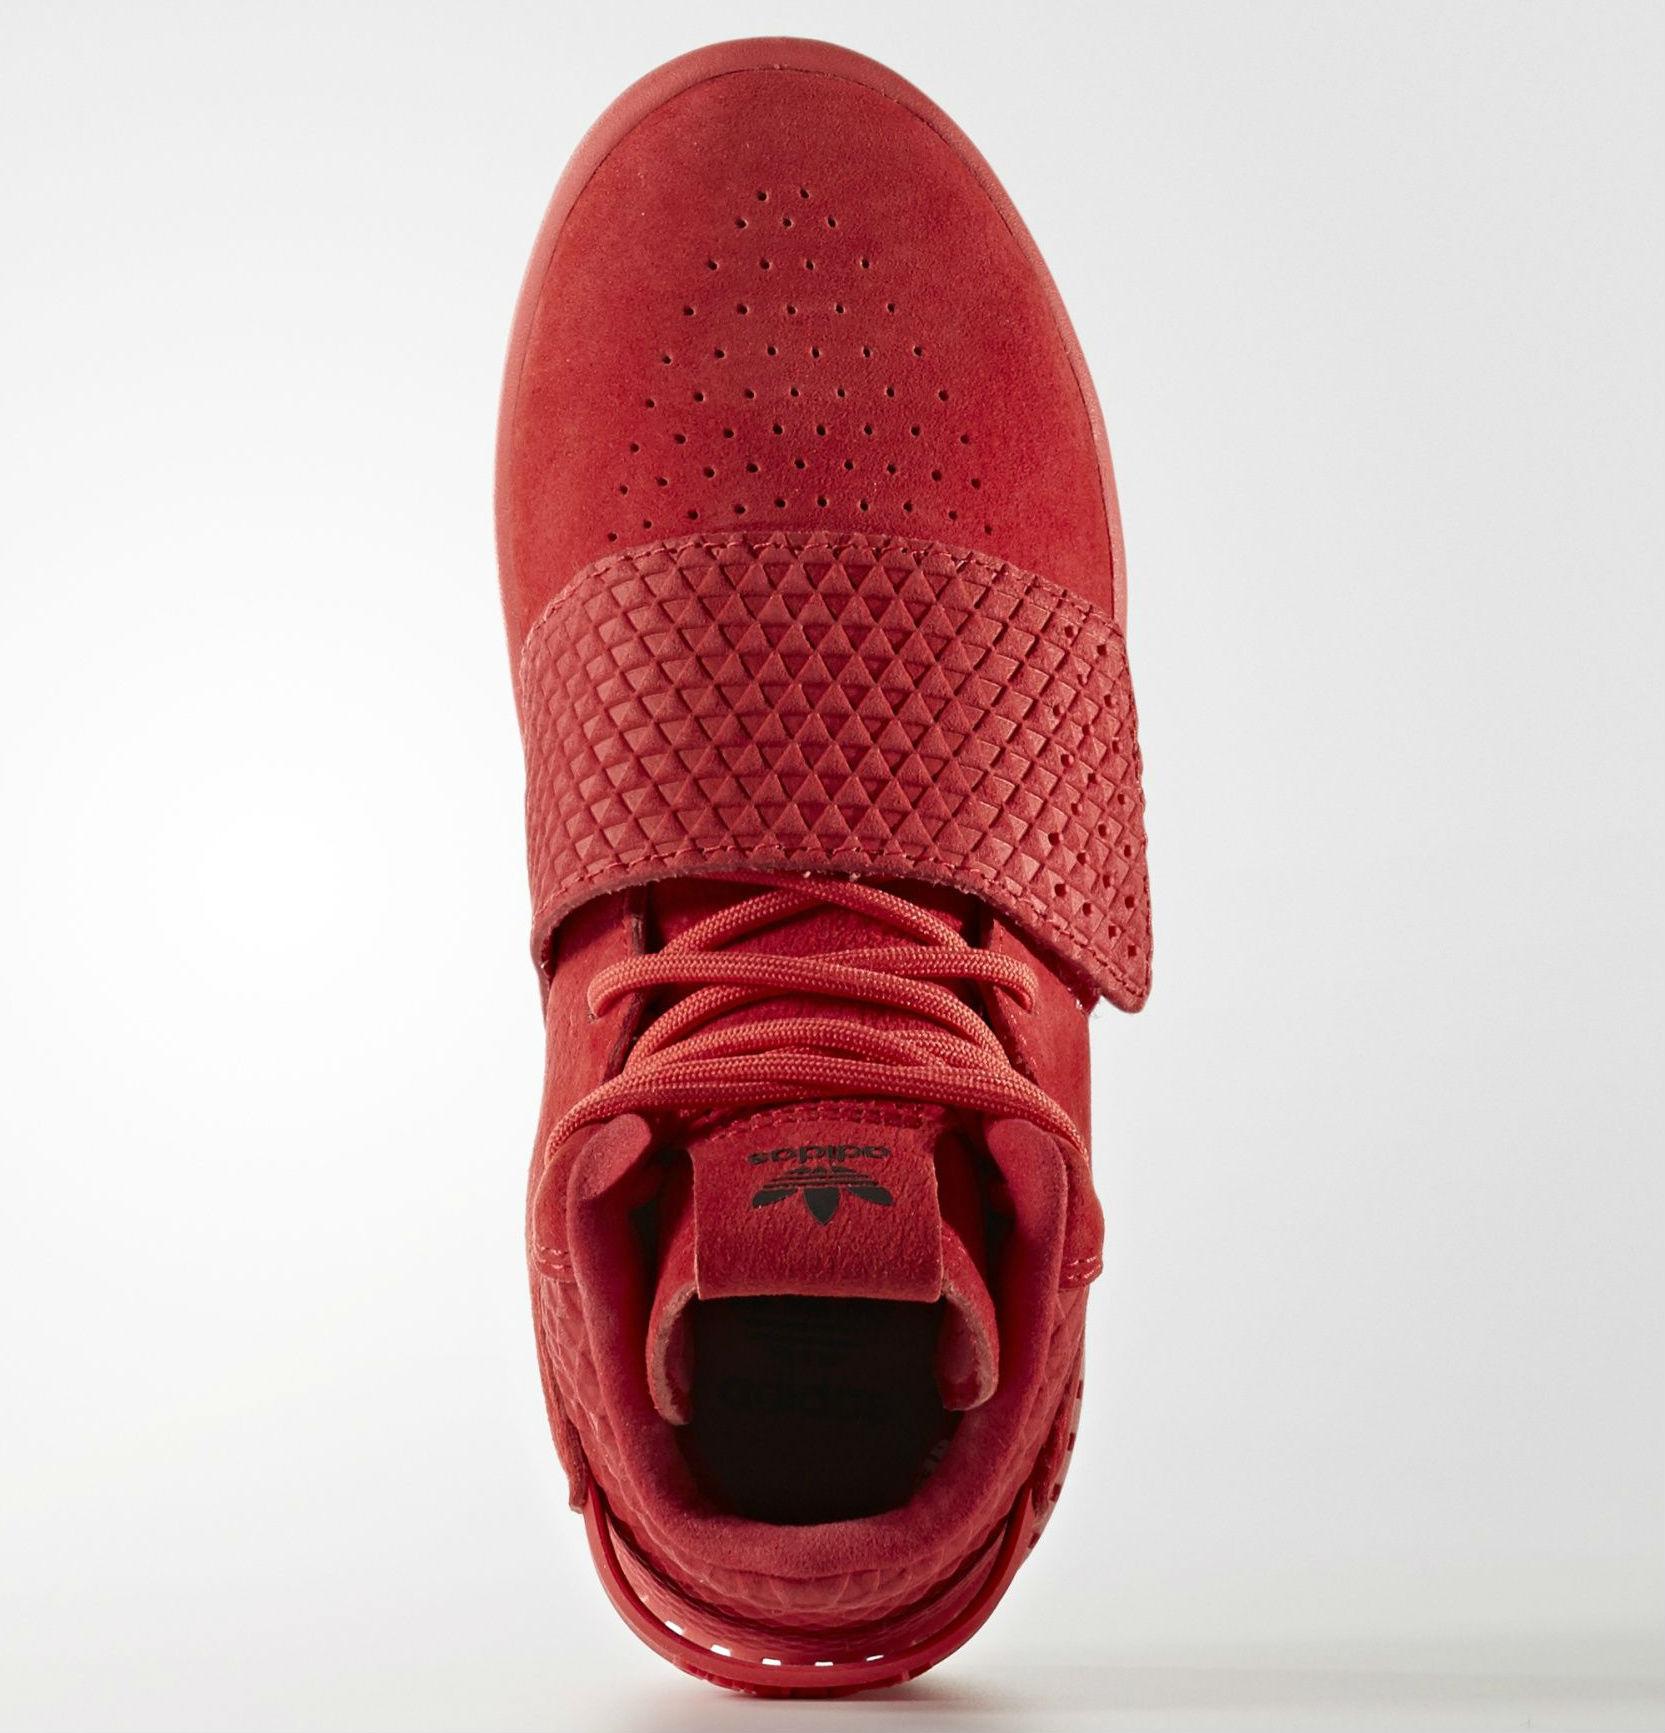 adidas Tubular Invader Red October Top